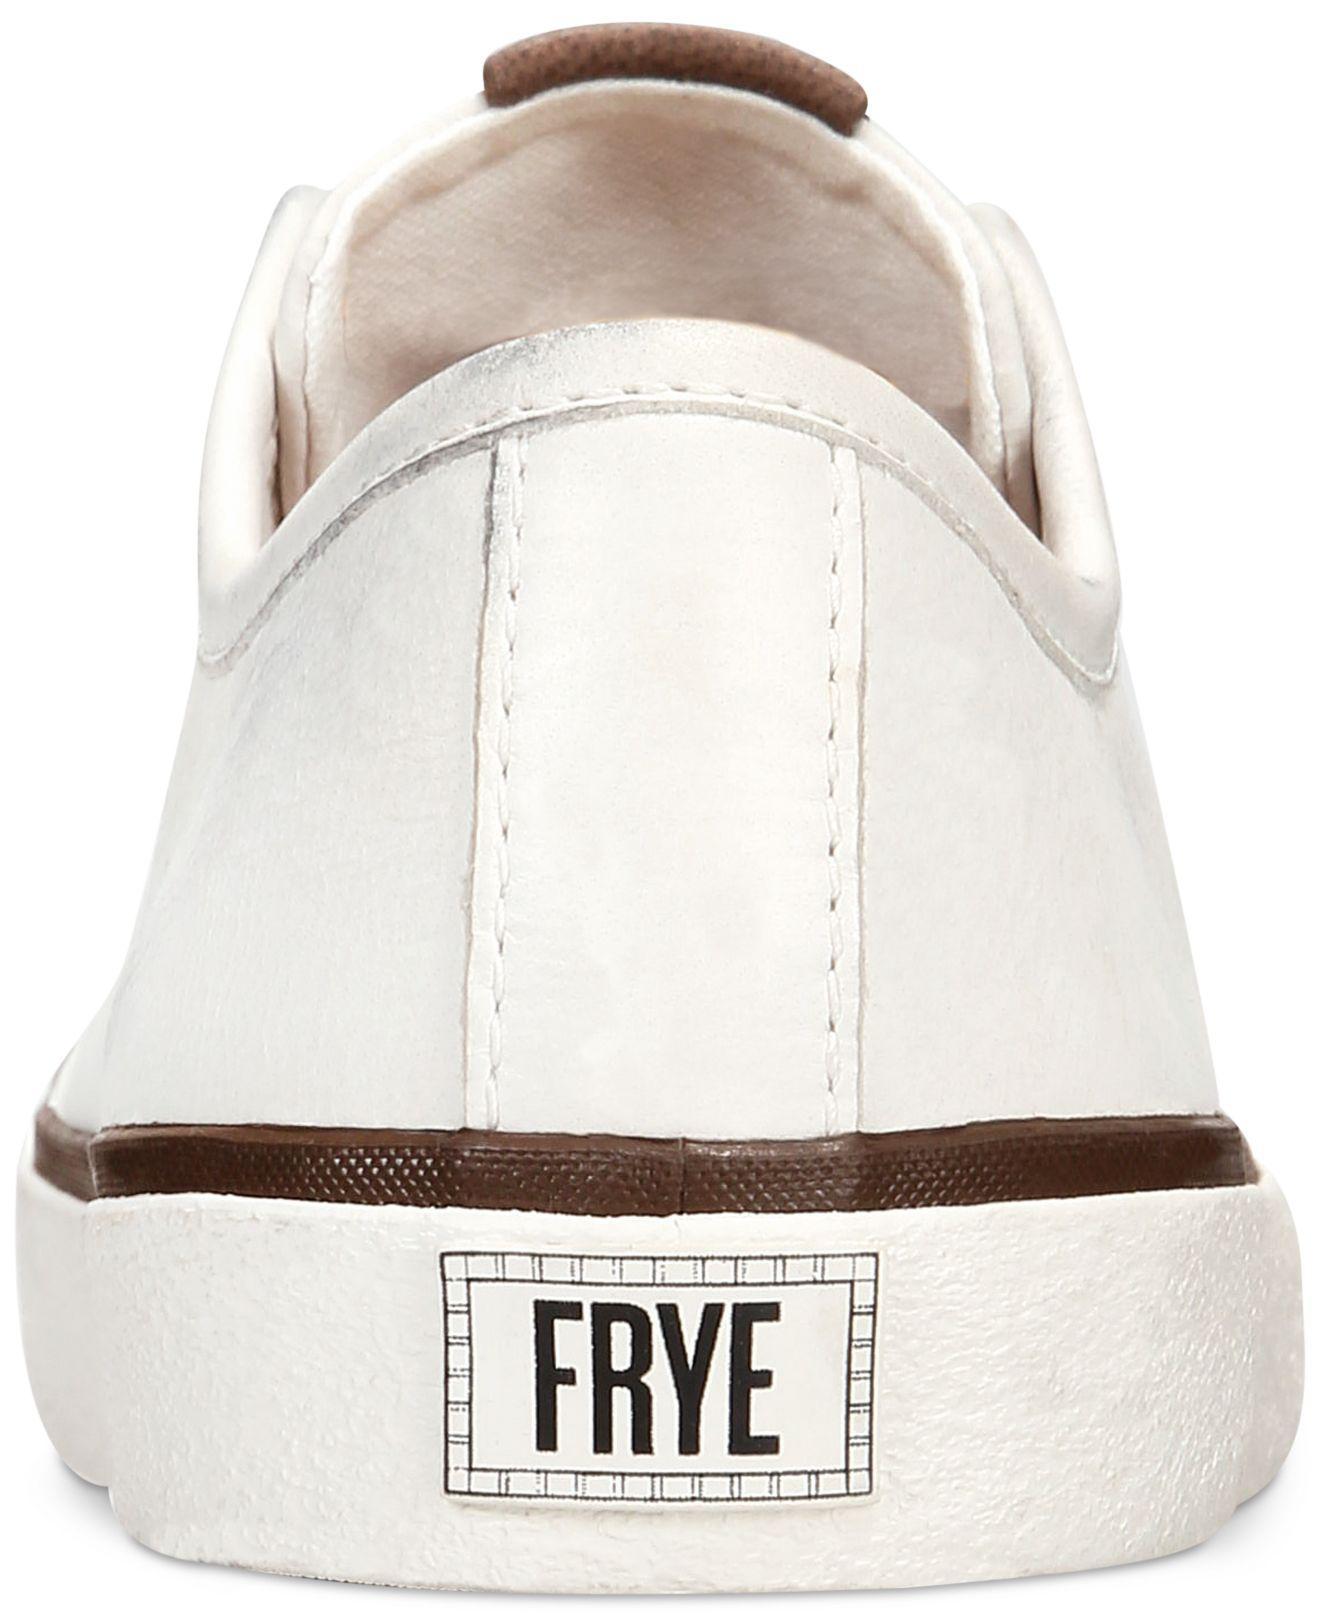 Frye Leather Claudia Slip-on Sneakers